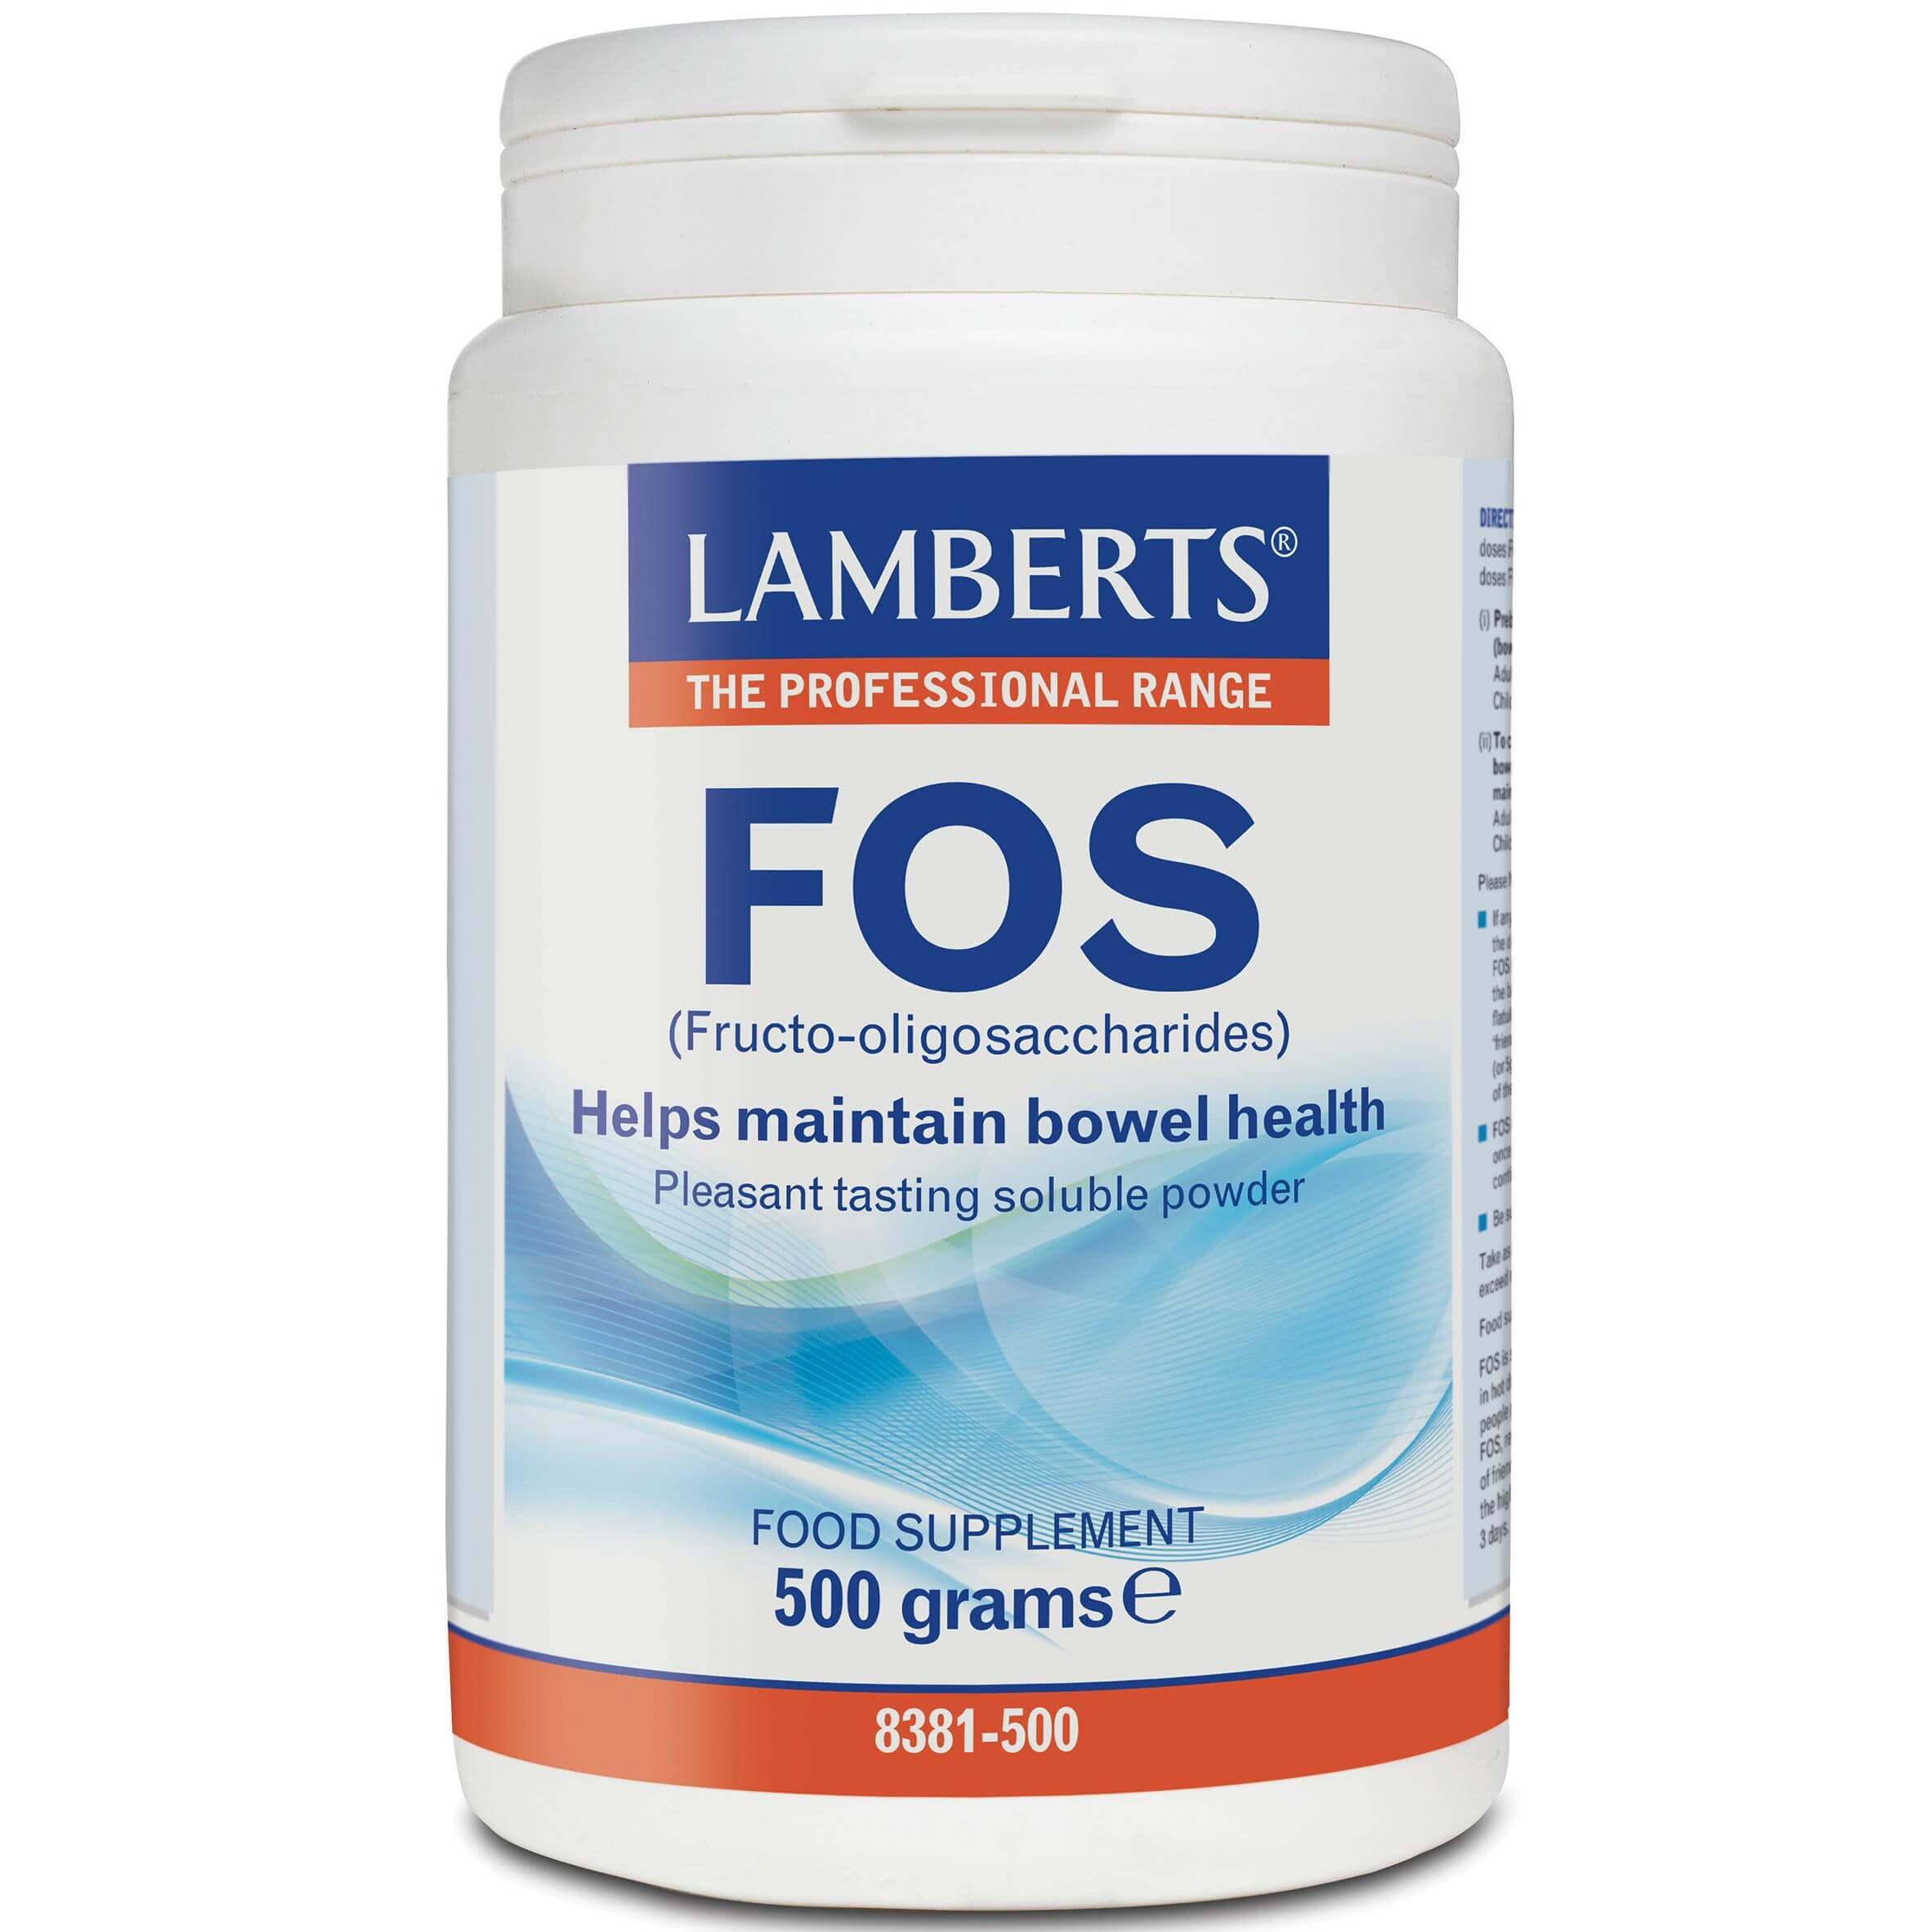 Lamberts FOS Συπλήρωμα Διατροφής για την Αύξηση Αριθμού των Βακτηρίων της Φυσιολογικής Εντερικής Χλωρίδας σε Σκόνη 500gr